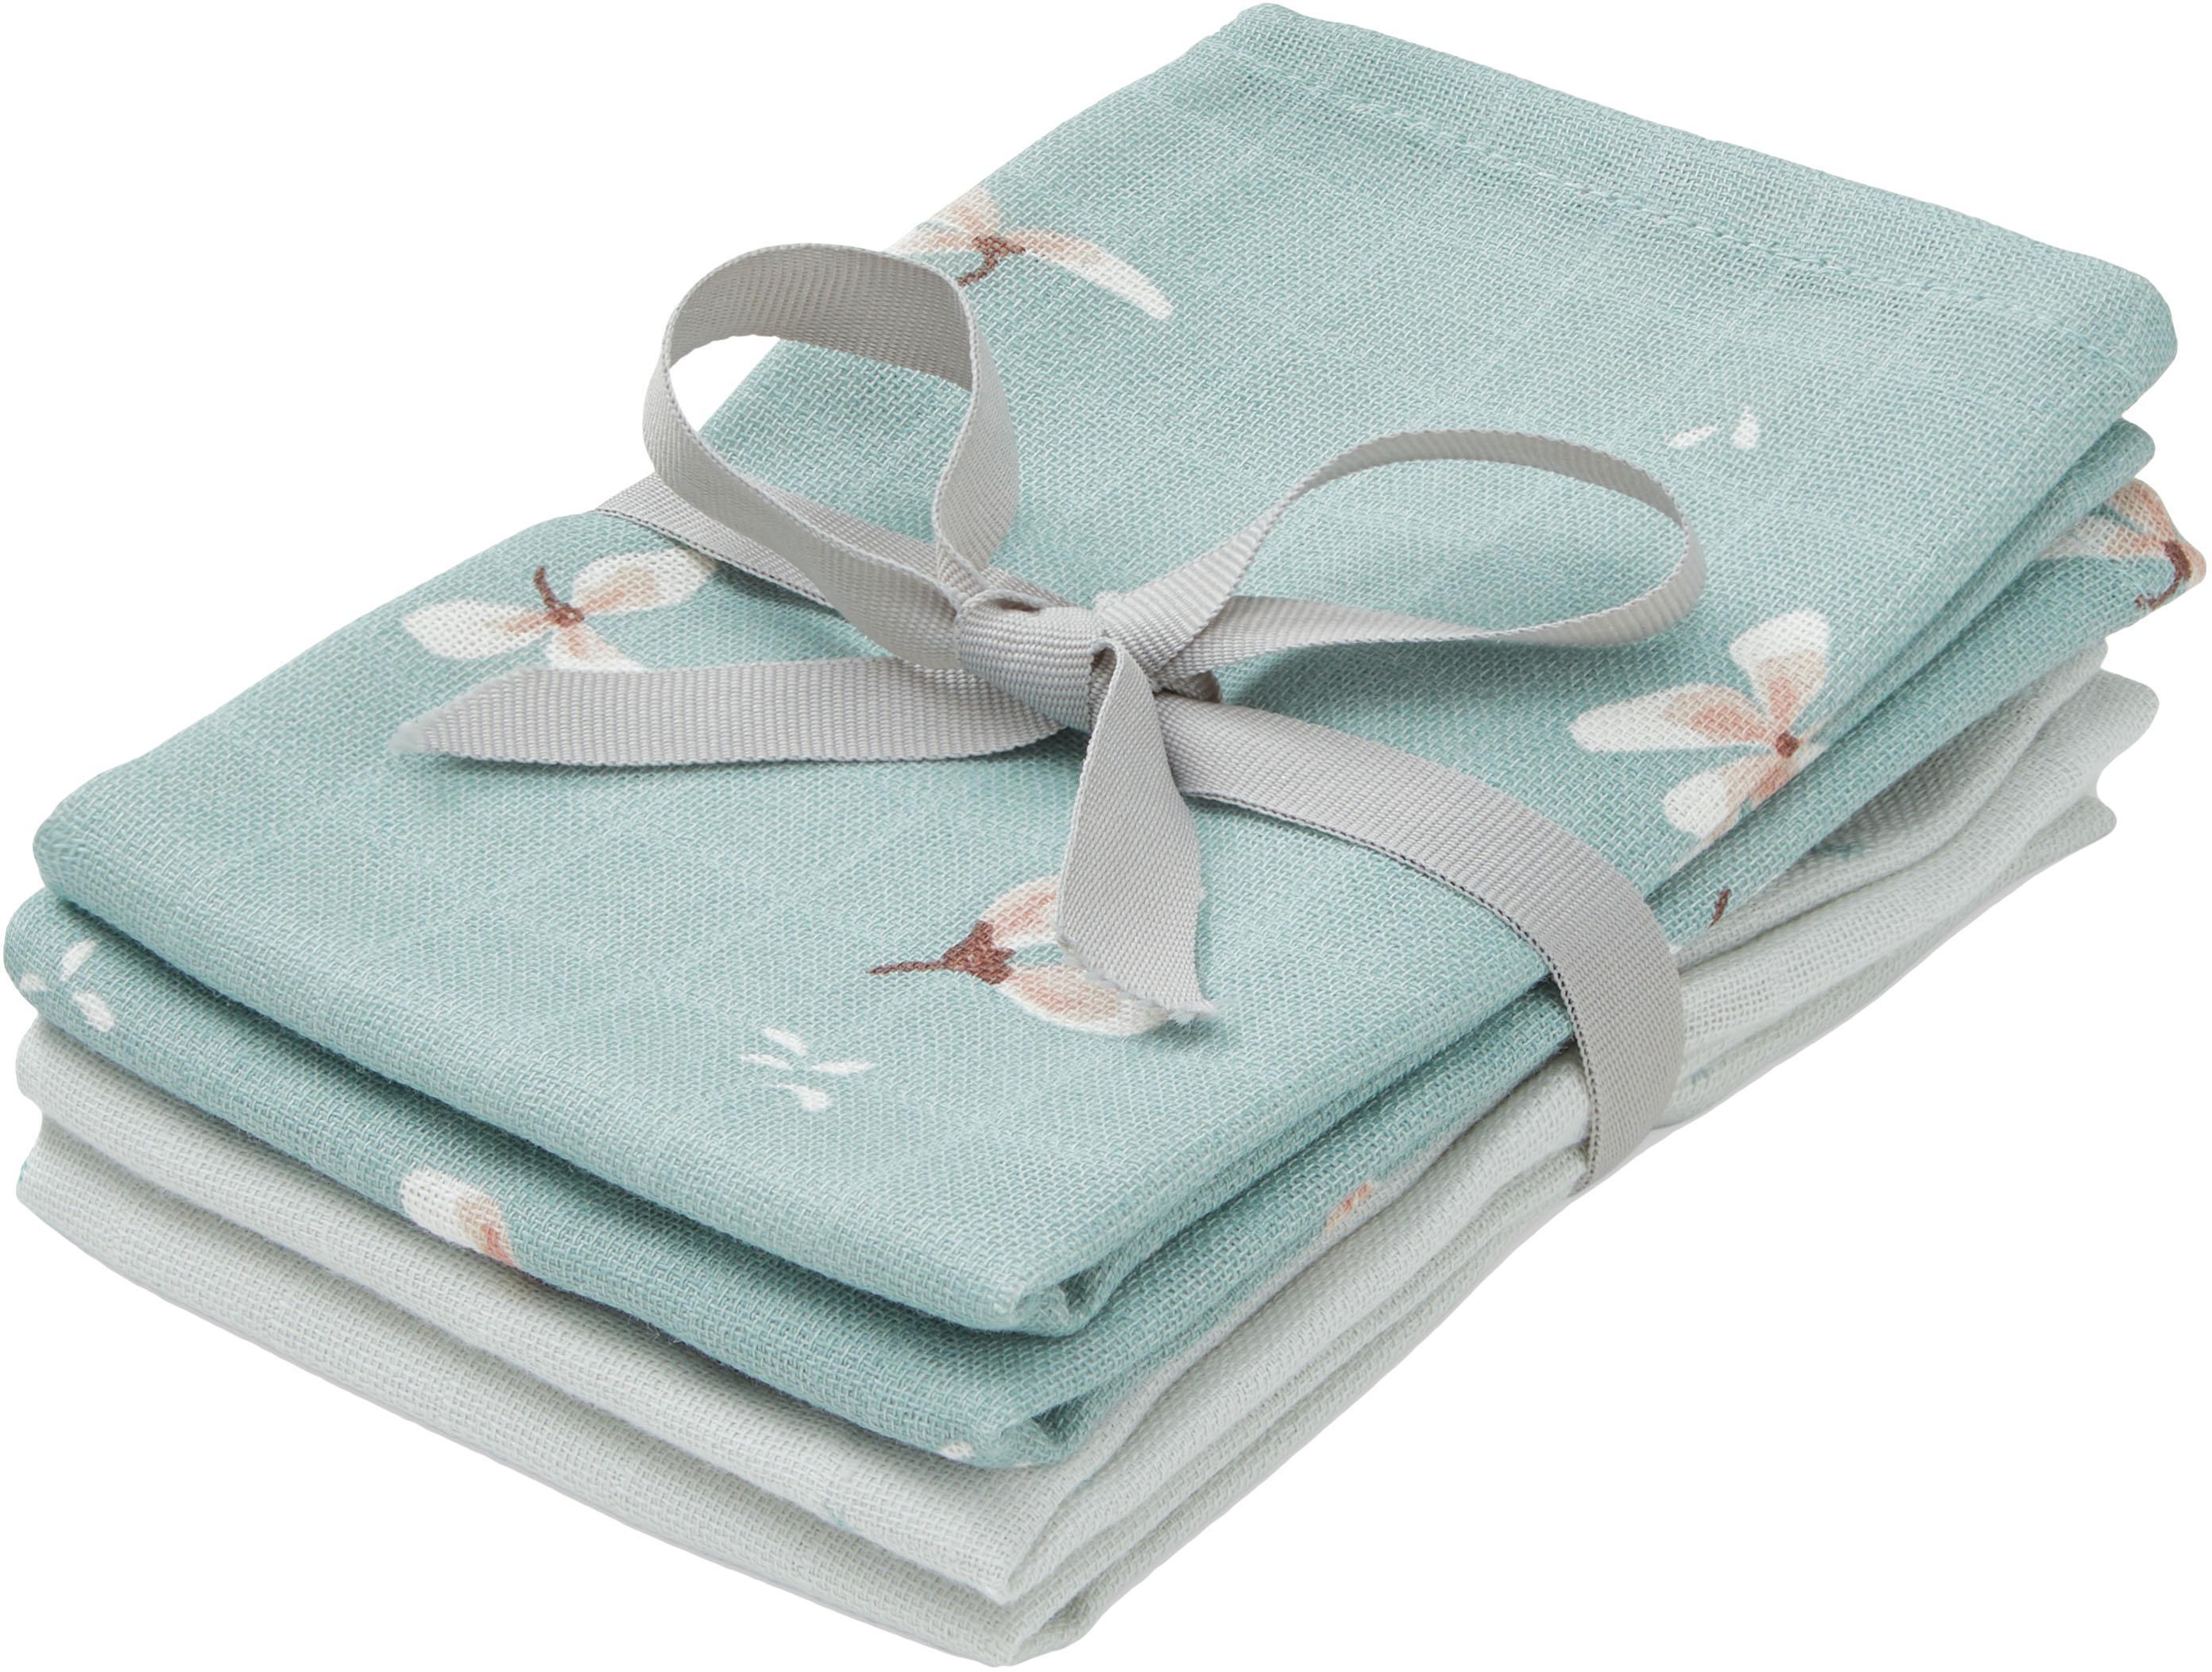 Set de toallitas de tela de algodón ecológico Wildflower, 4pzas., 100%algodón ecológico, certificado GOTS, Azul claro, crema, gris, rosa, An 30 x L 30 cm